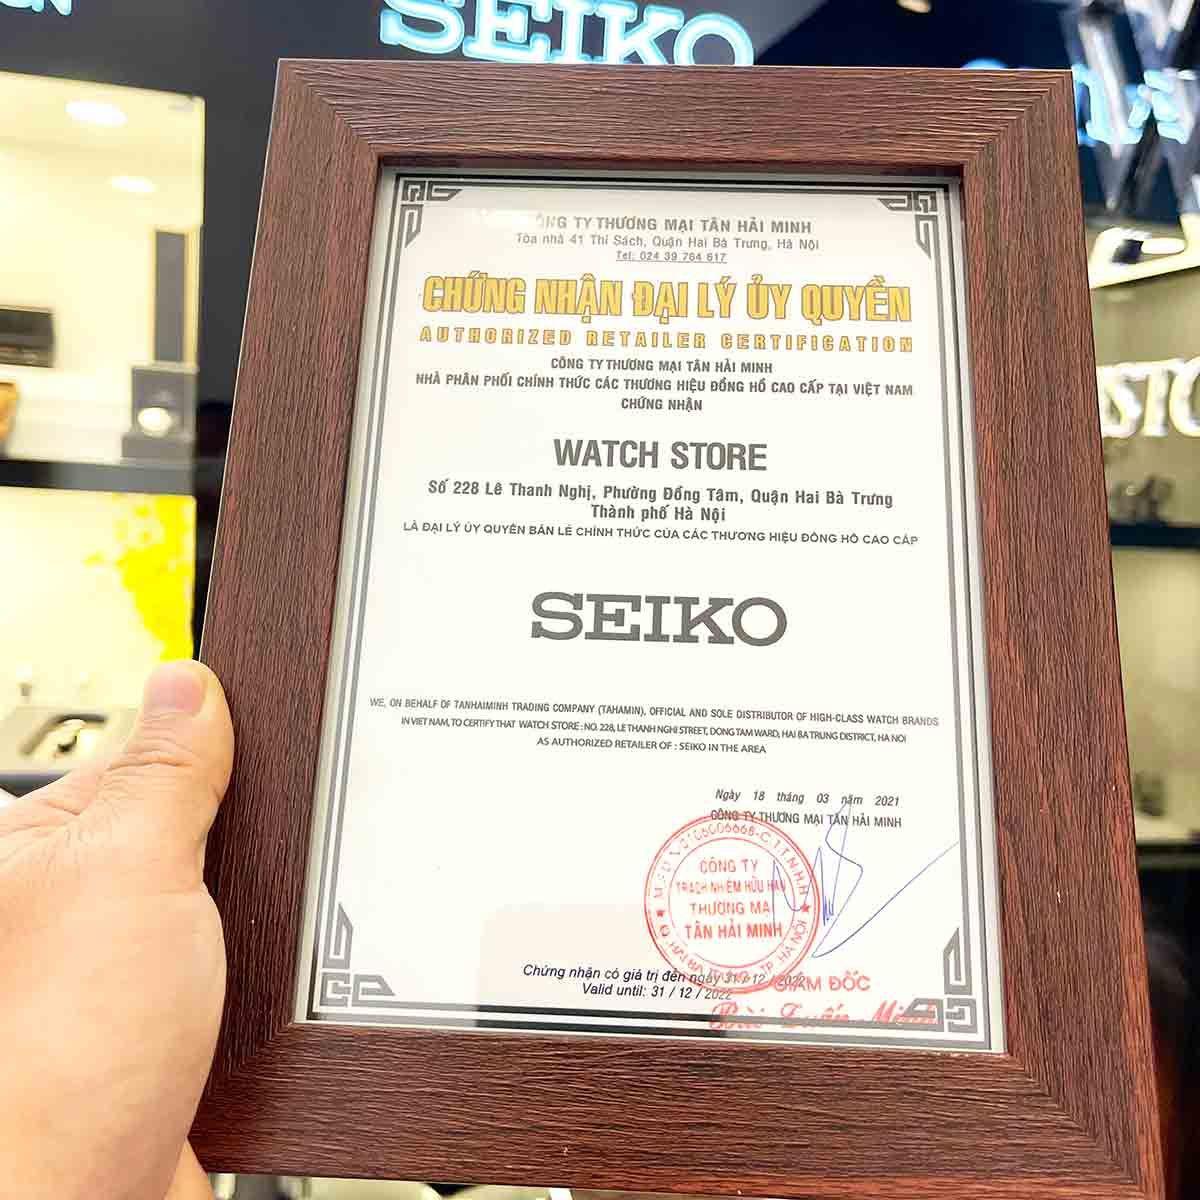 Đồng Hồ Seiko™ Nam Từ 3 - 5 Triệu - Ảnh 2